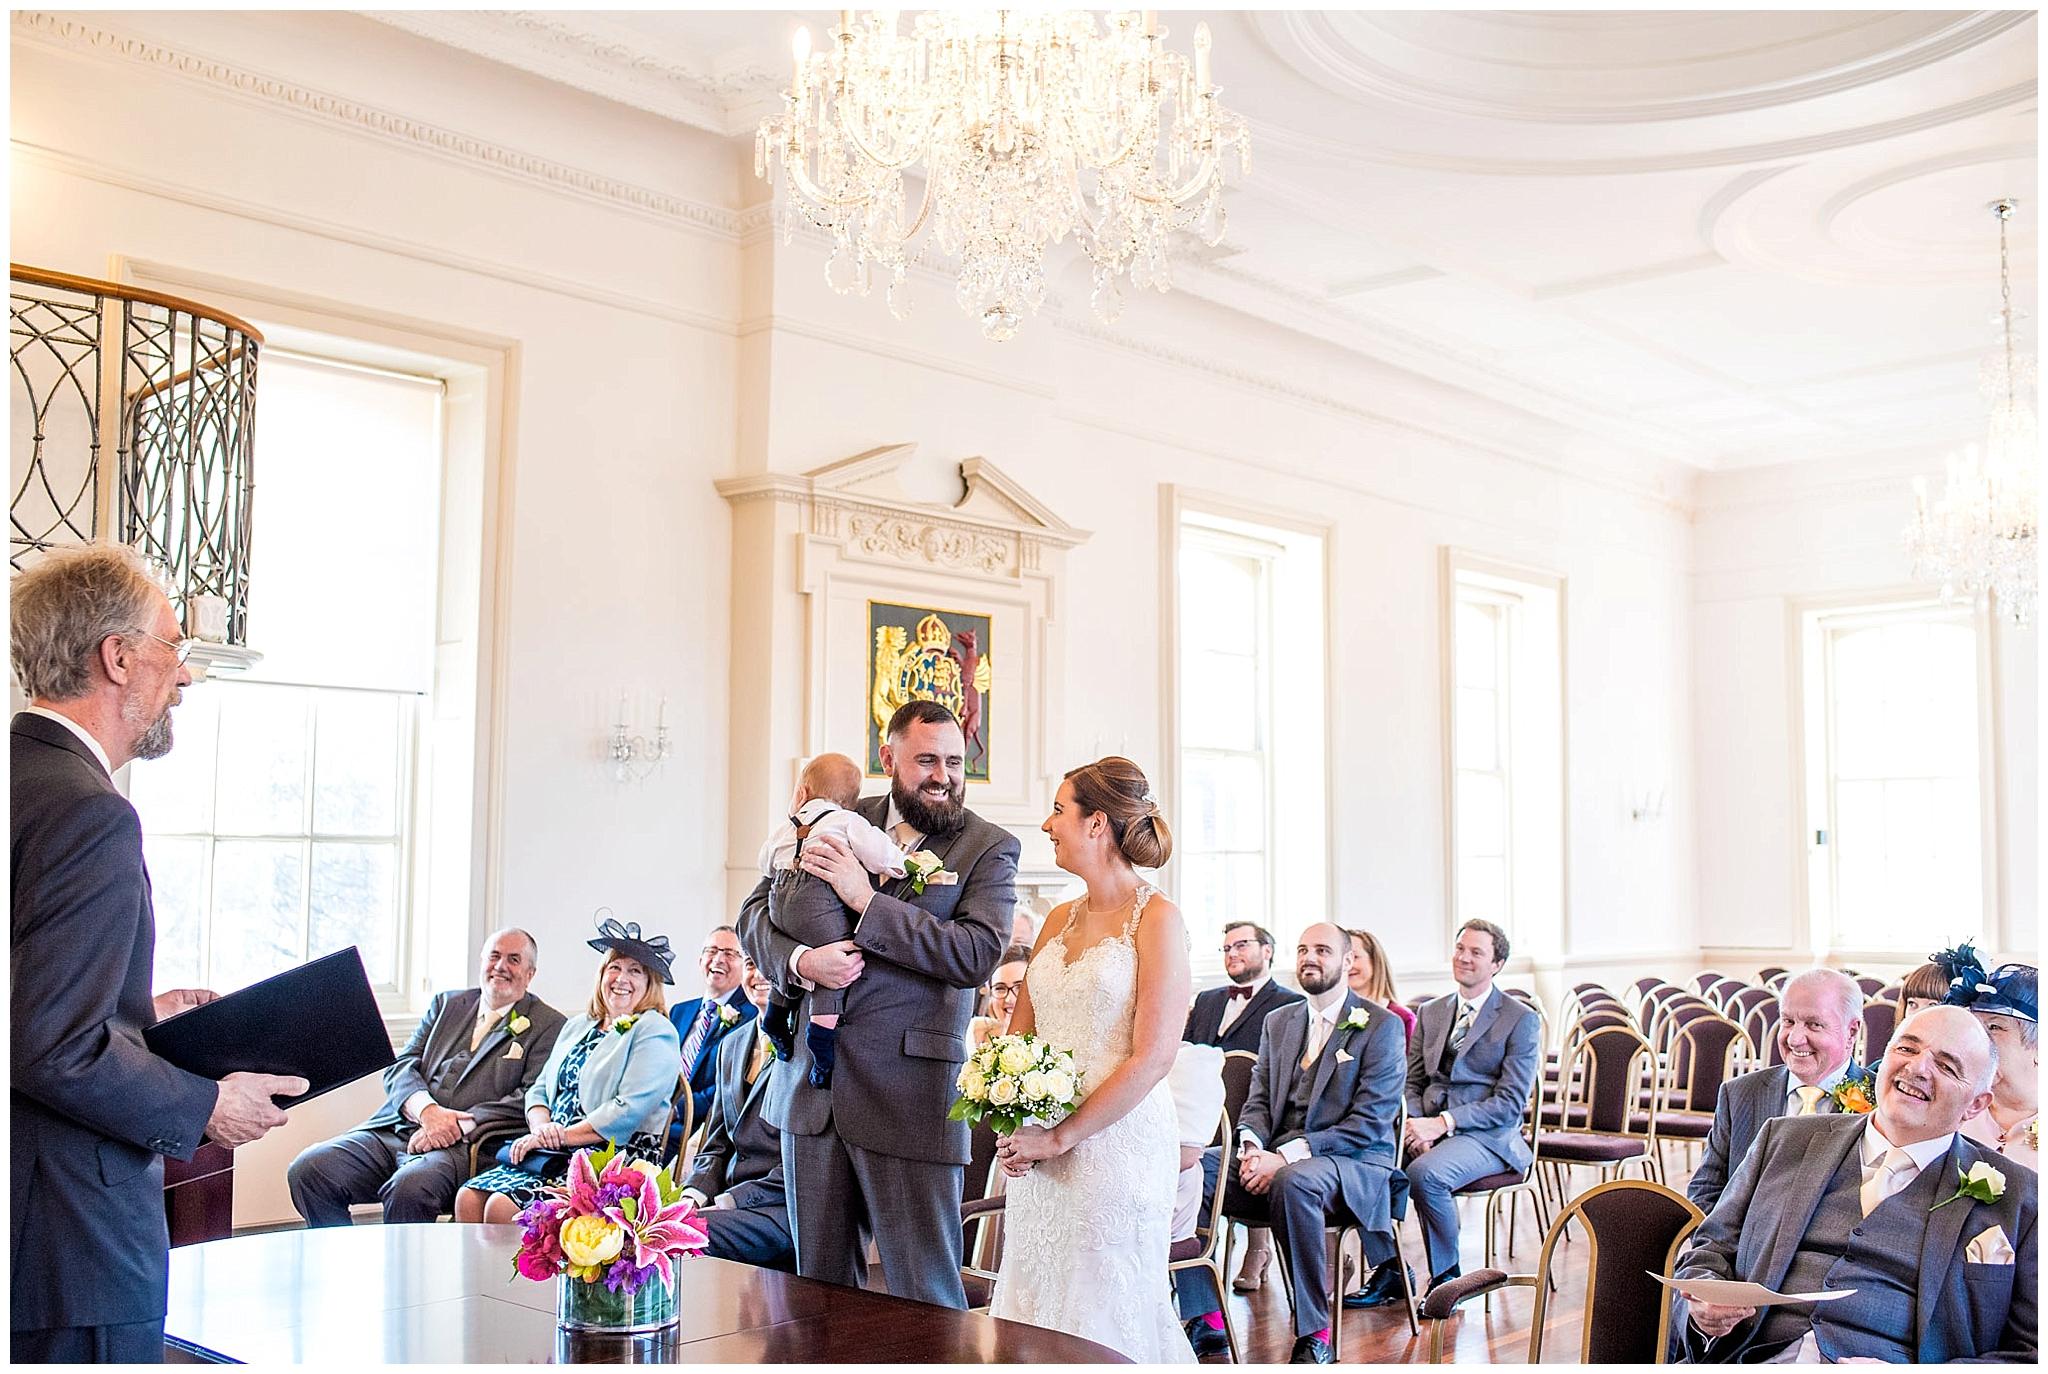 Lisa-&-Michael-Wedding-Guildhall-&-Hotel-Du-Vin-46